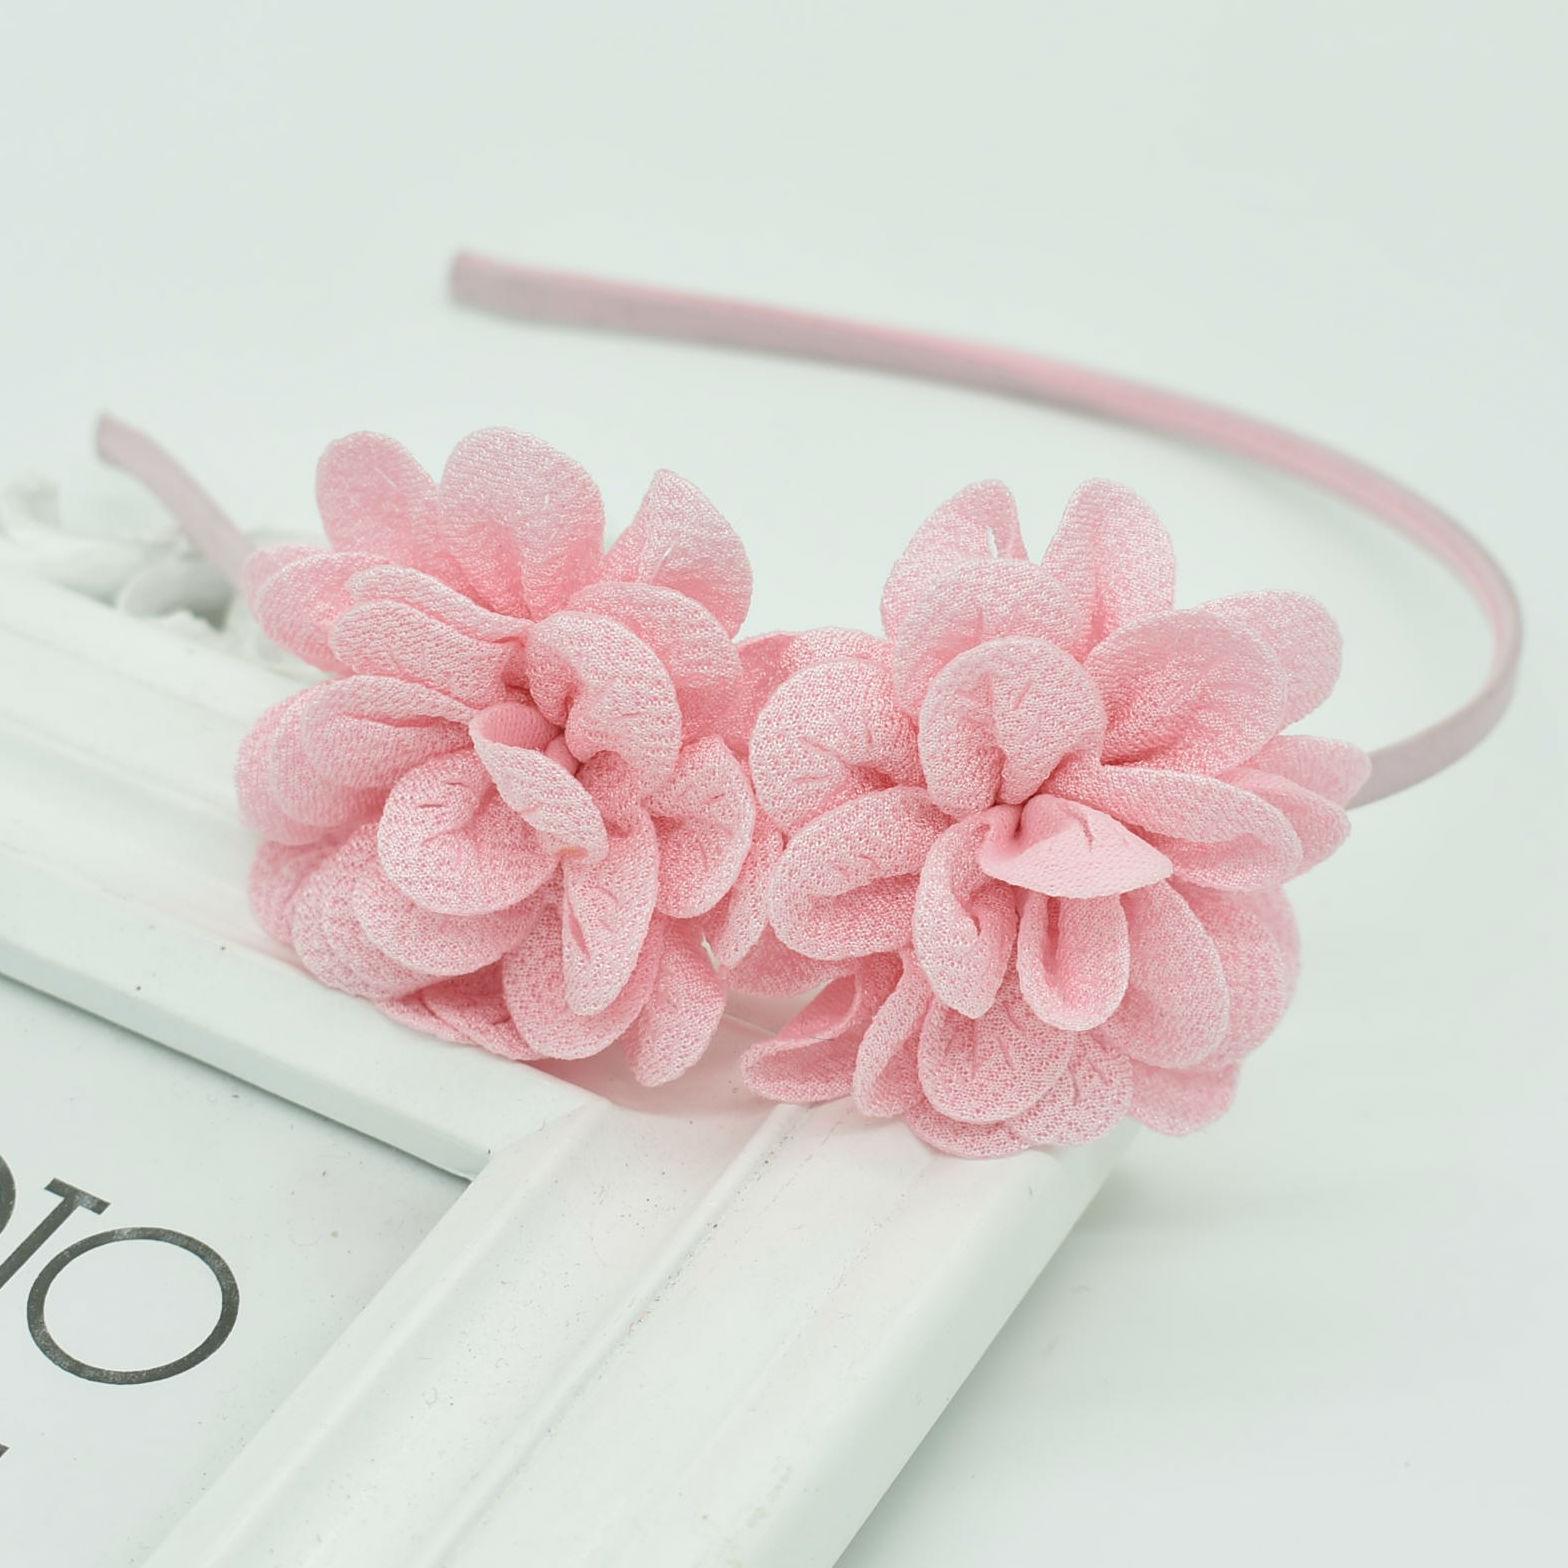 2018 New popular Children's Two flower headband headdress girls multicolor hair accessories flower hair band Female pop gift(China)